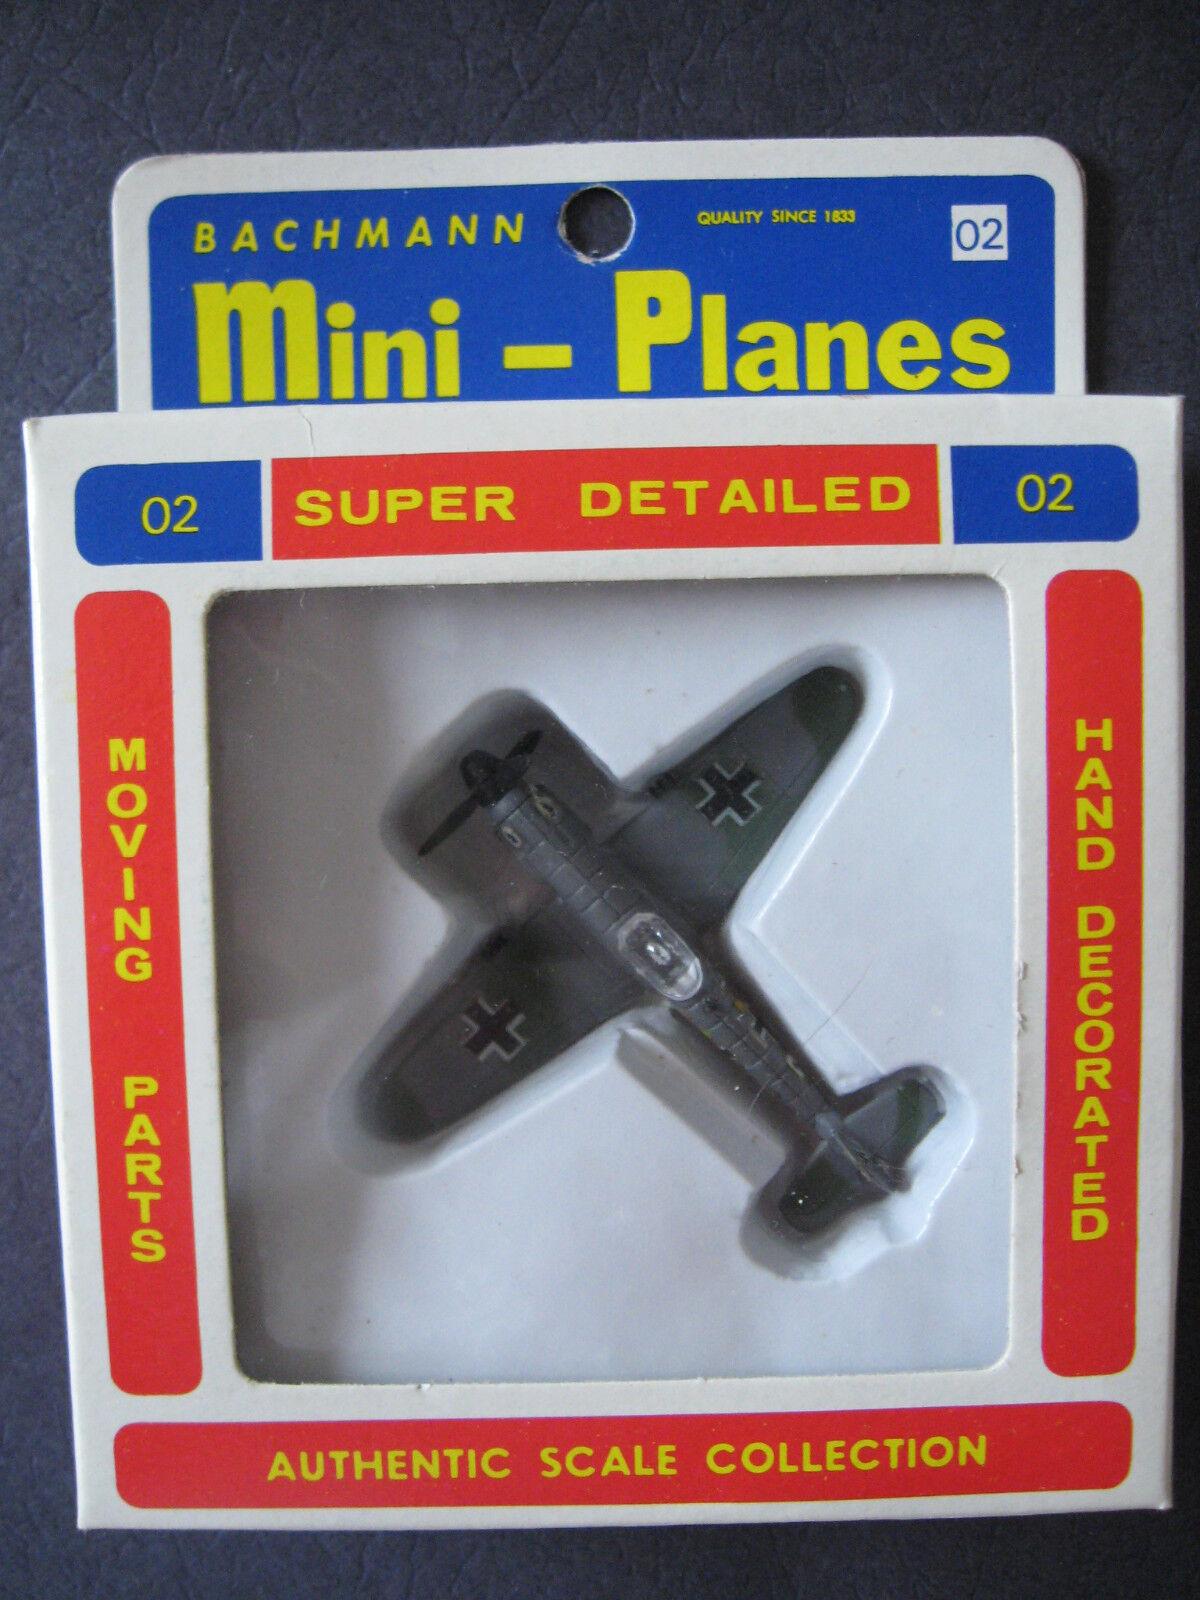 Bachmann Mini-Planes Messerschmitt ME109 MINT